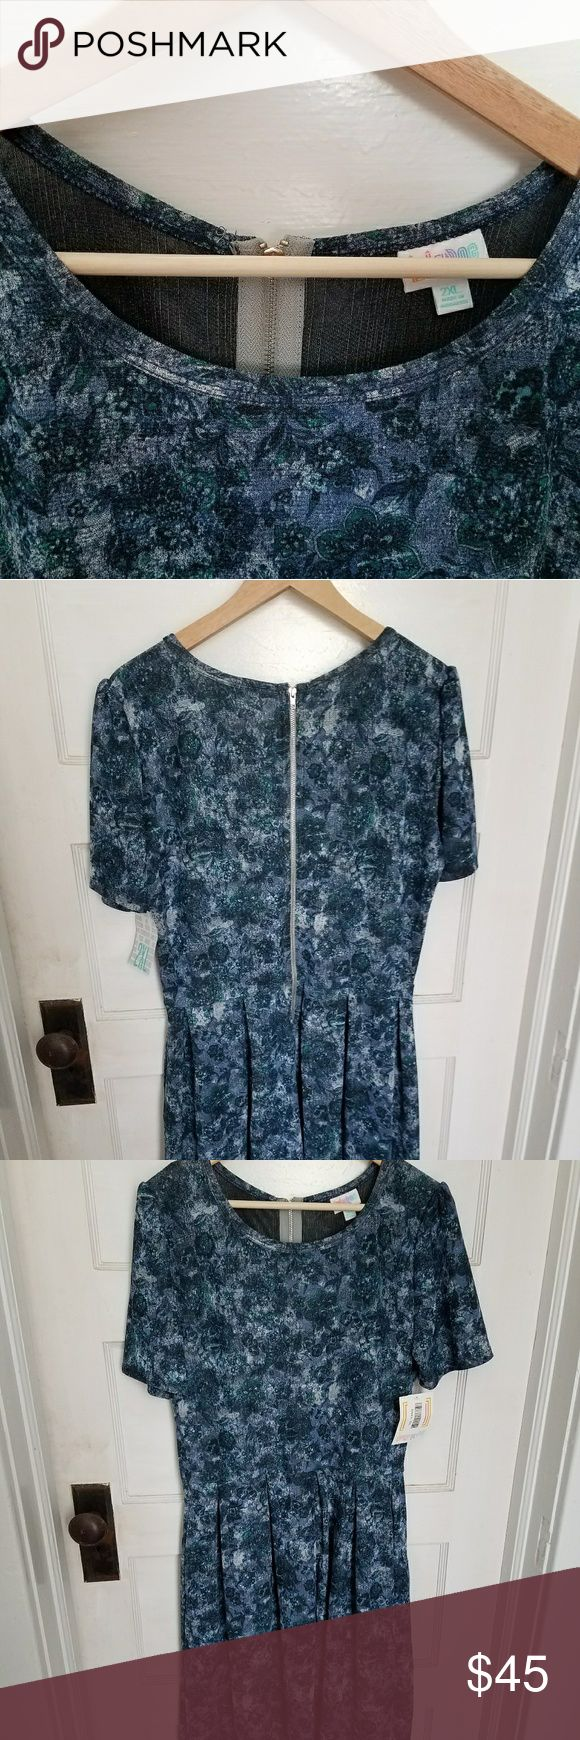 BNWT 2XL Amelia Brand New with tags LuLaRoe Amelia dress...lighter material in 2XL LuLaRoe Dresses Midi